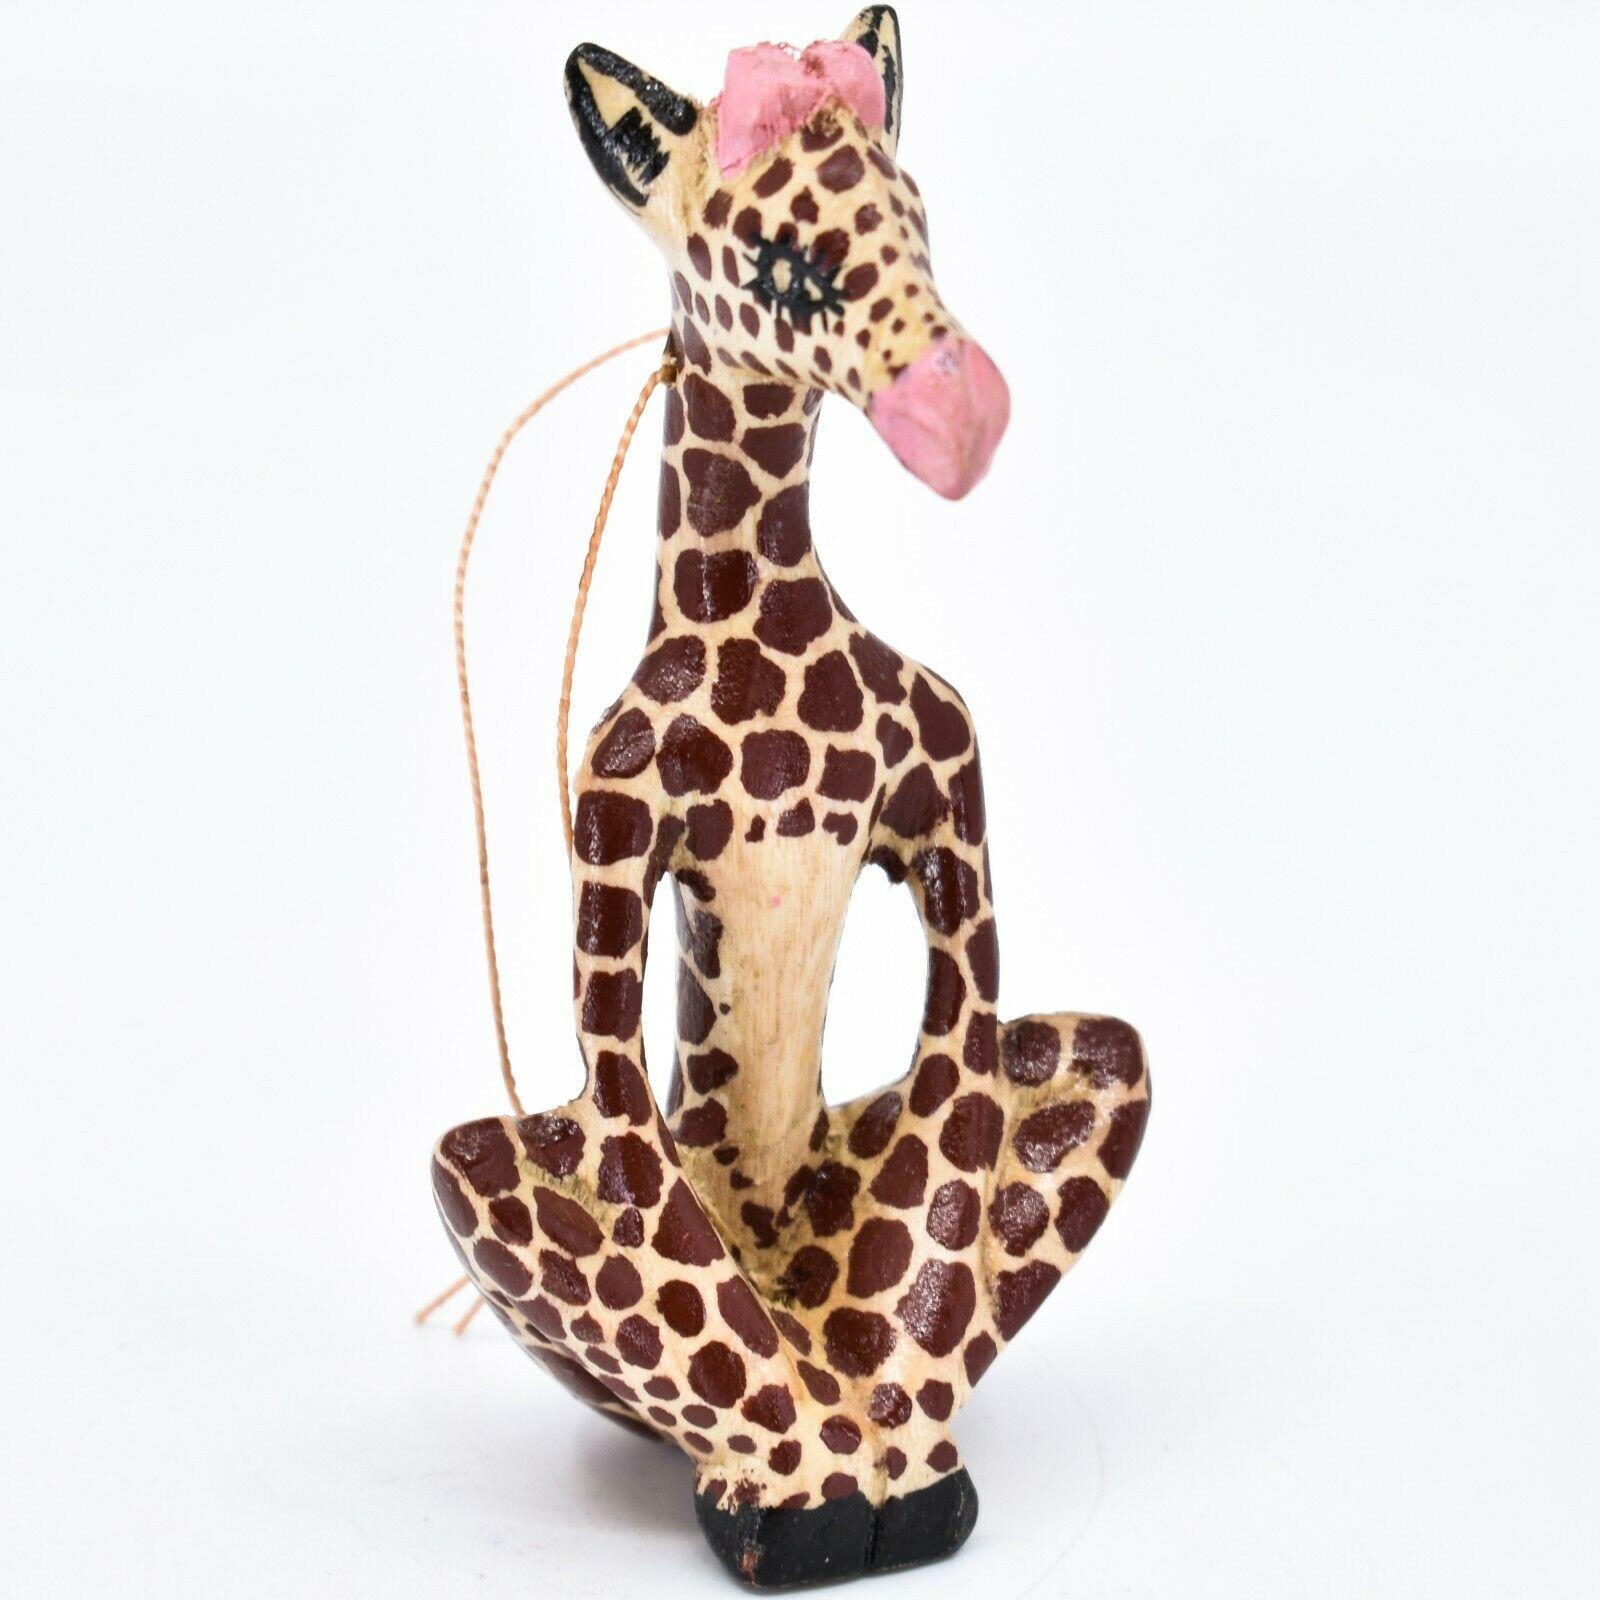 Hand Carved Painted Jacaranda Wood Yoga Lotus Giraffe Christmas Ornament